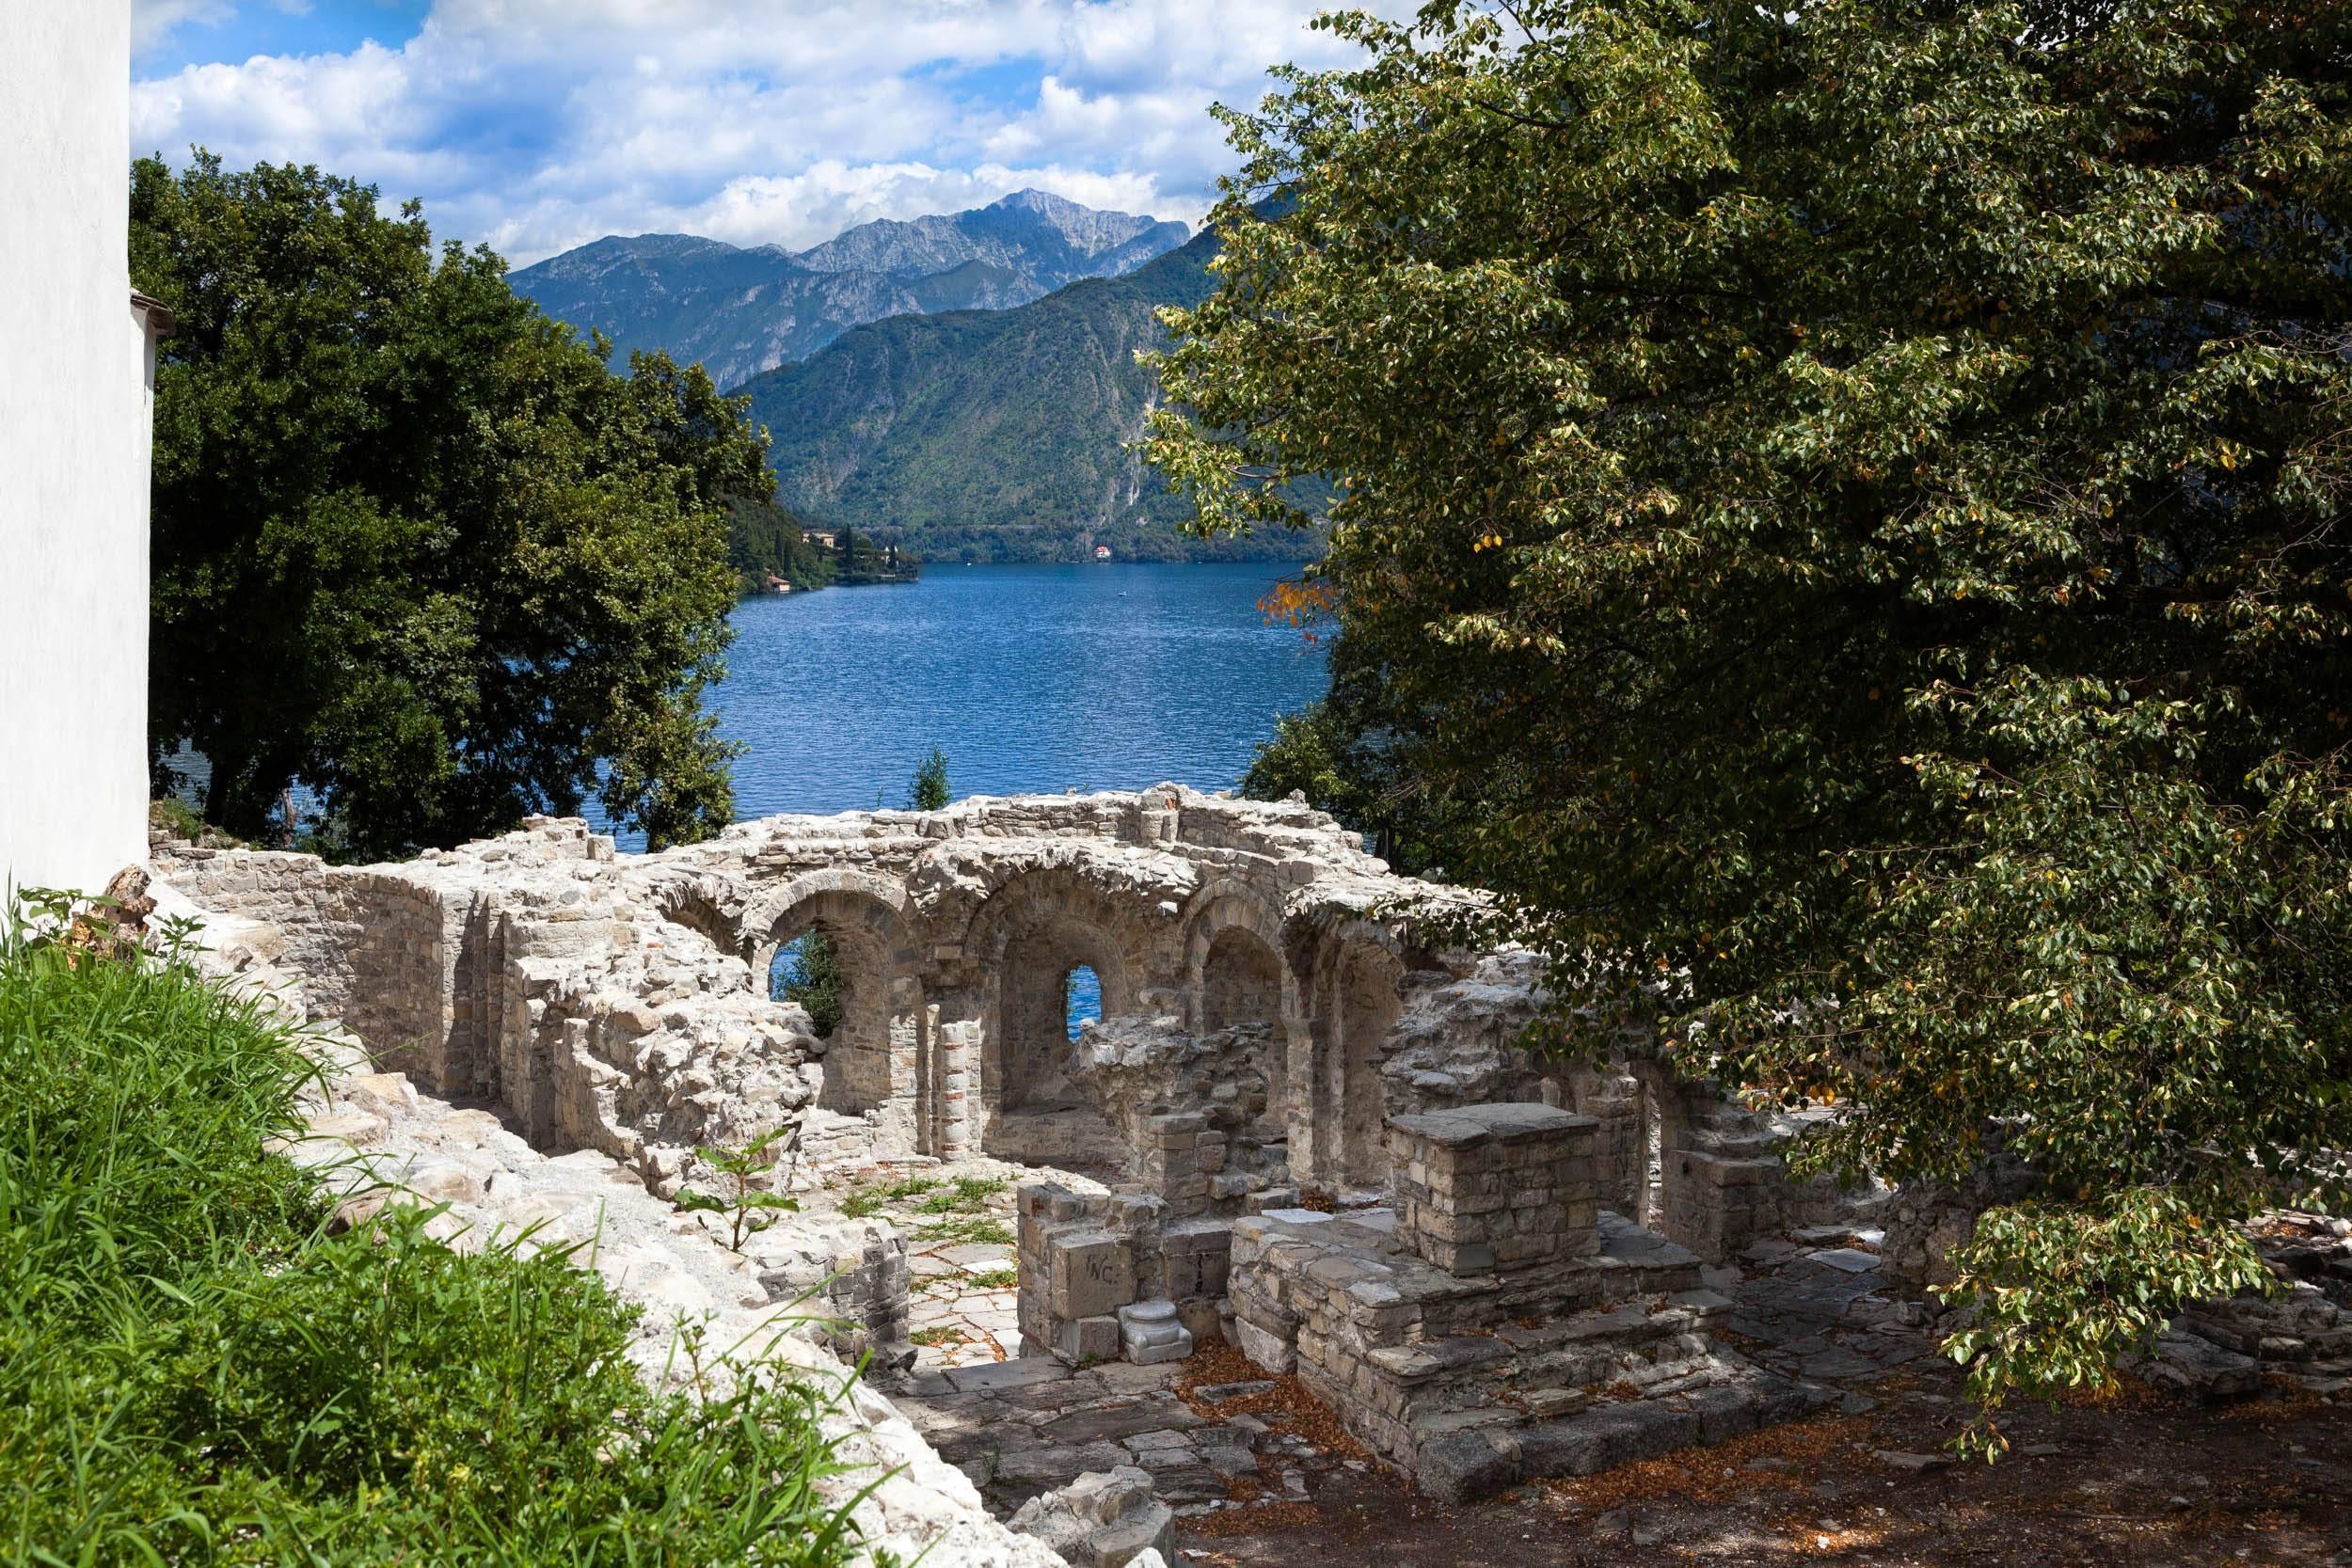 Basilica di Sant'Eufemia - Isola Comacina - Lago di Como